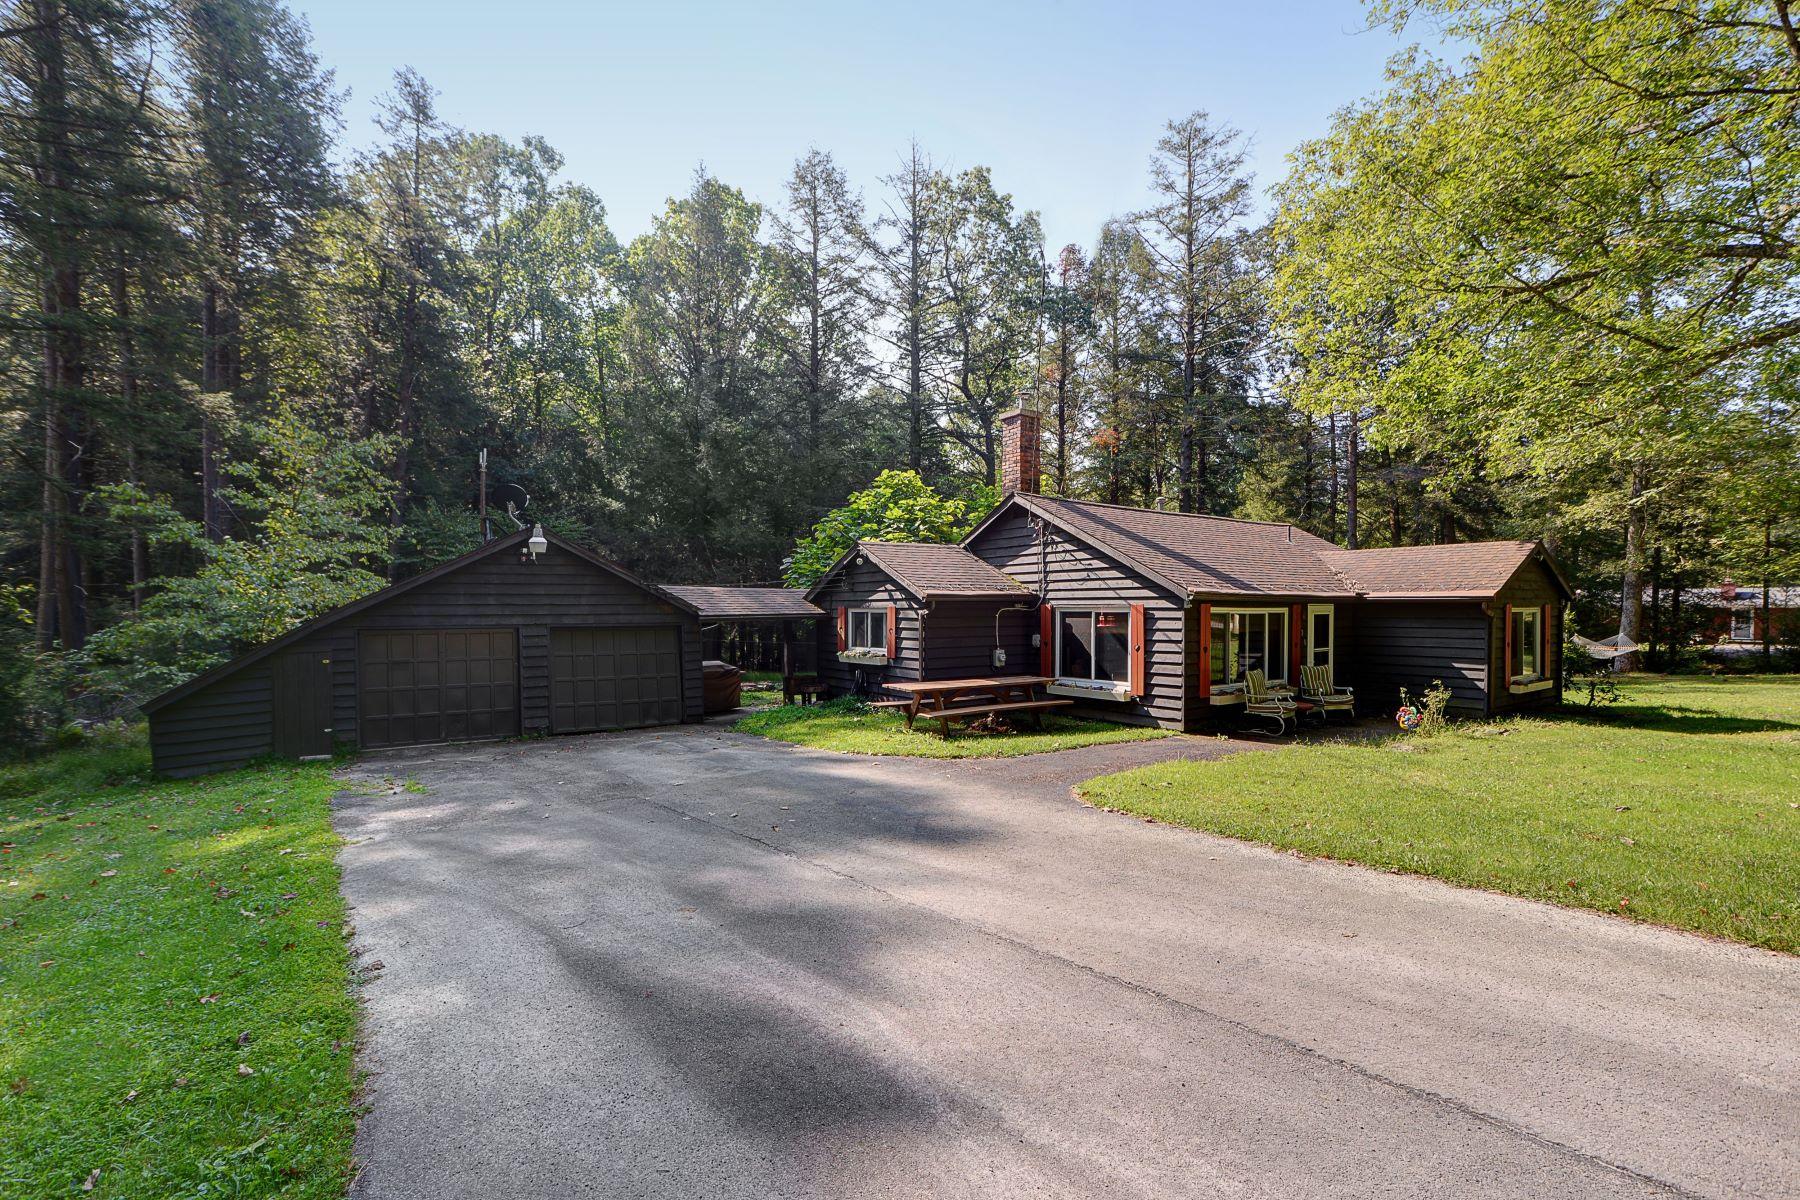 Single Family Homes for Sale at 220 DW Lane Ligonier Township, Pennsylvania 15658 United States